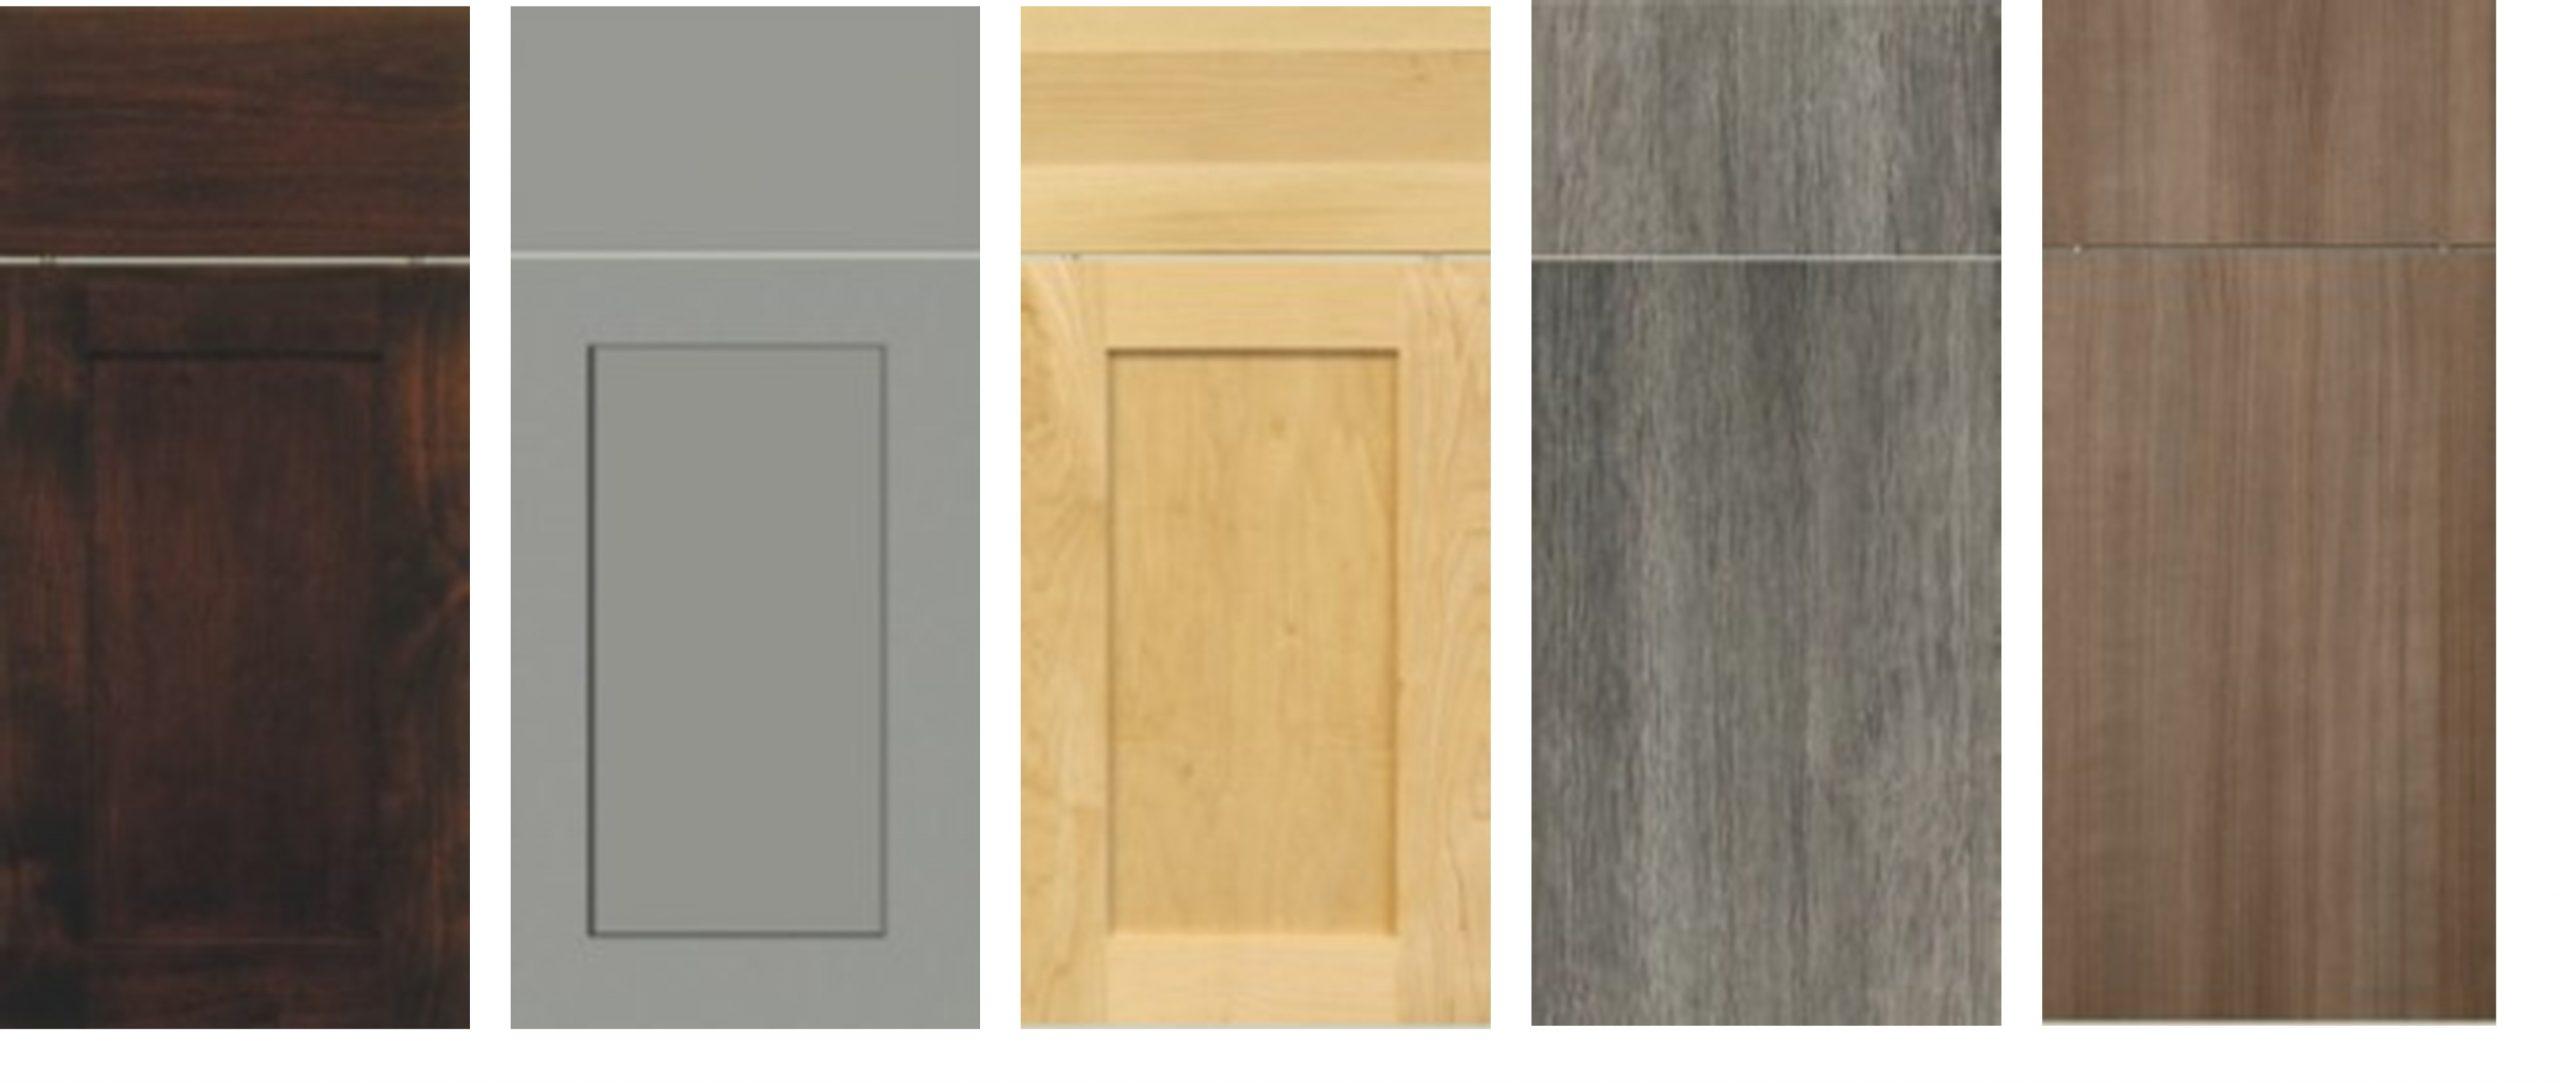 https://artisankitchens.ca/wp-content/uploads/2021/09/Cabinet-Doors-scaled.jpg